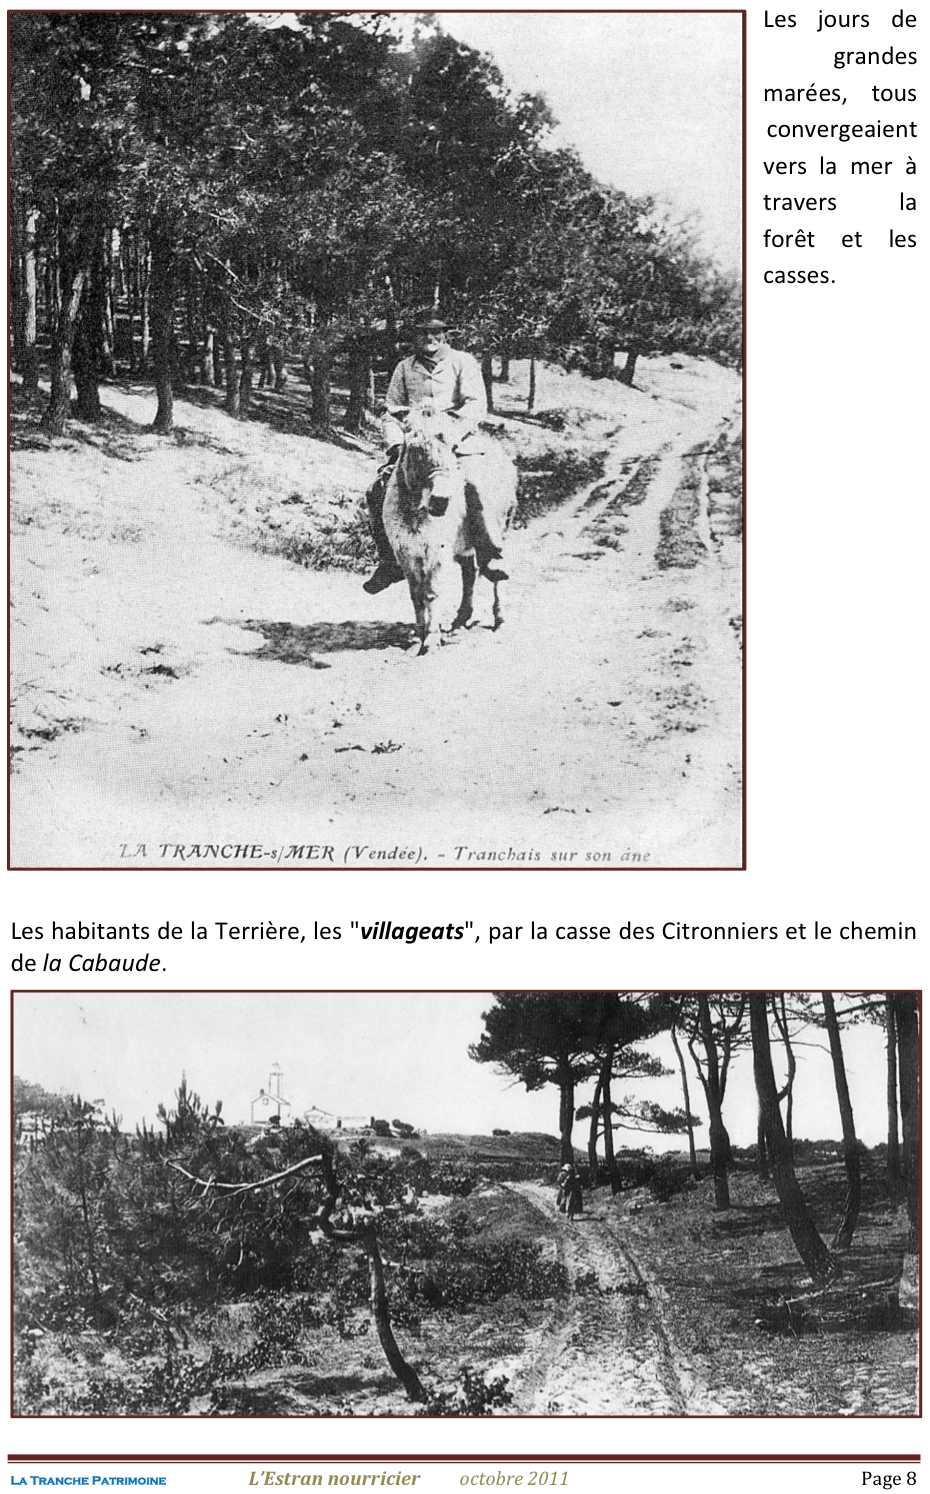 Lestran Nourricier 8 jpeg.jpg